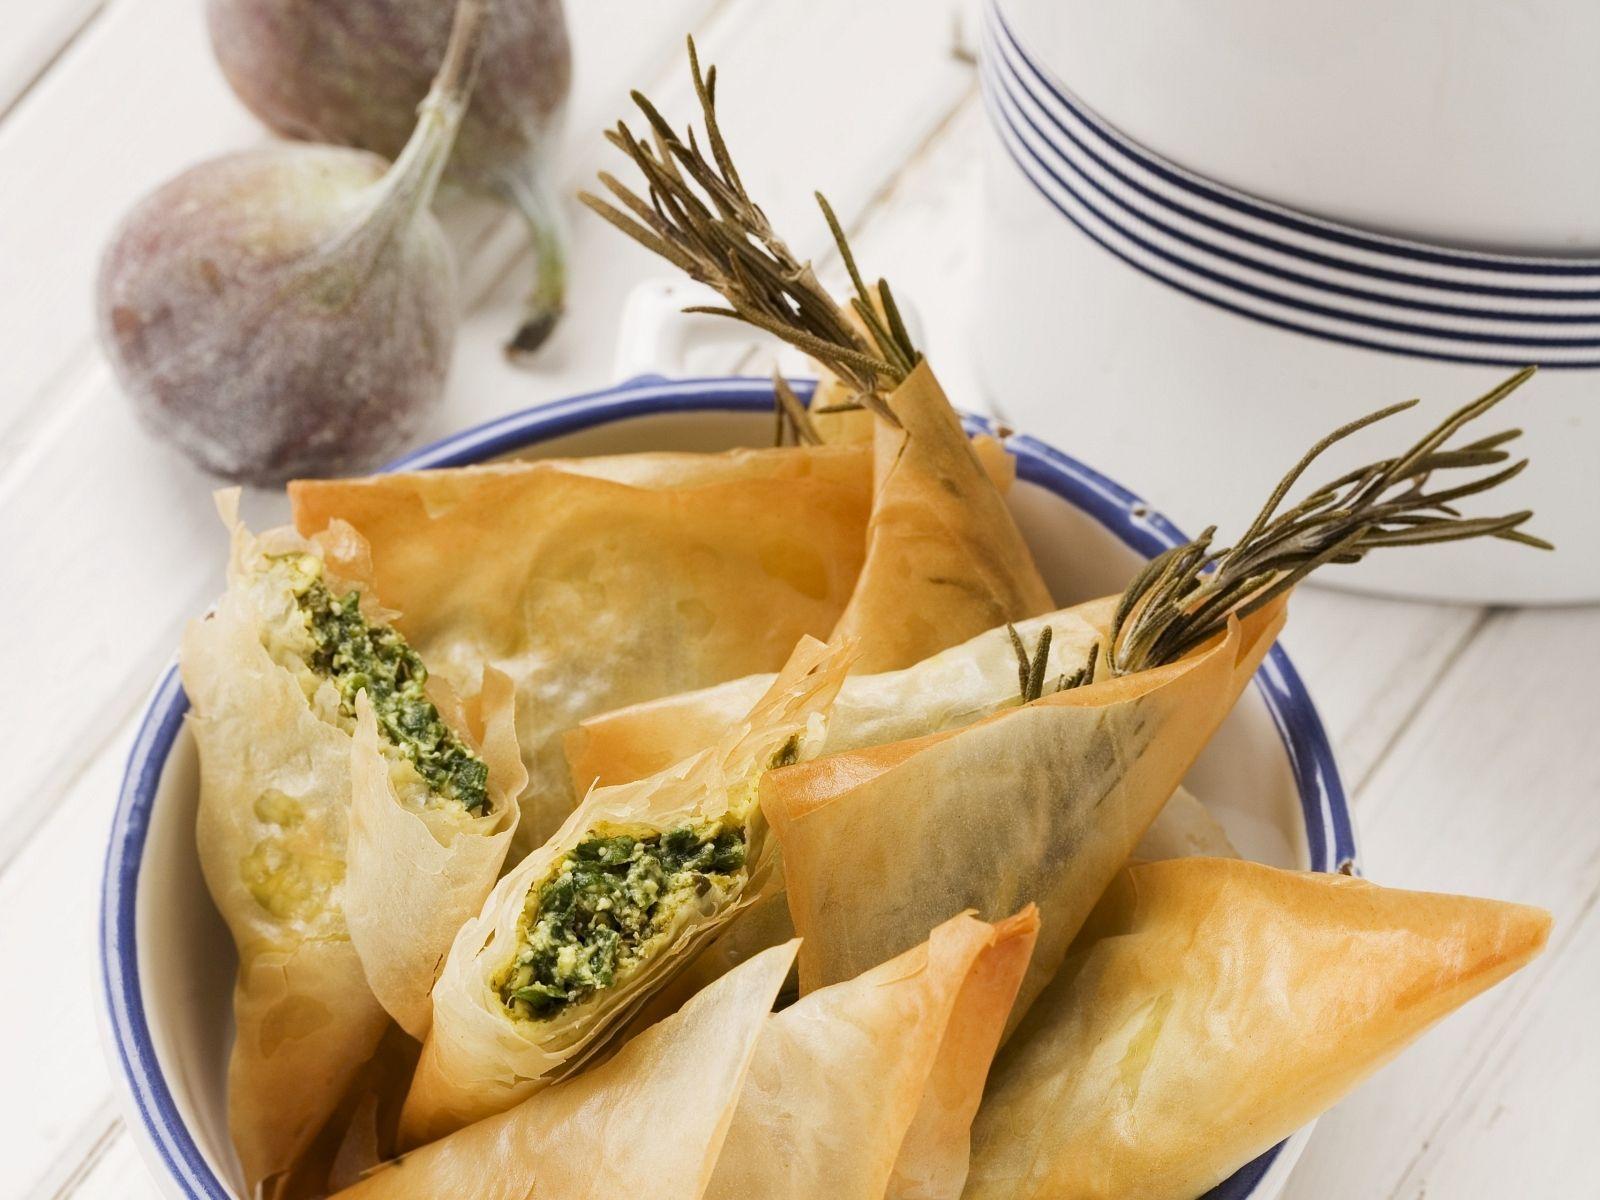 Filoteigtaschen mit zweierlei Füllung Spinat Feta oder Feige Walnuss